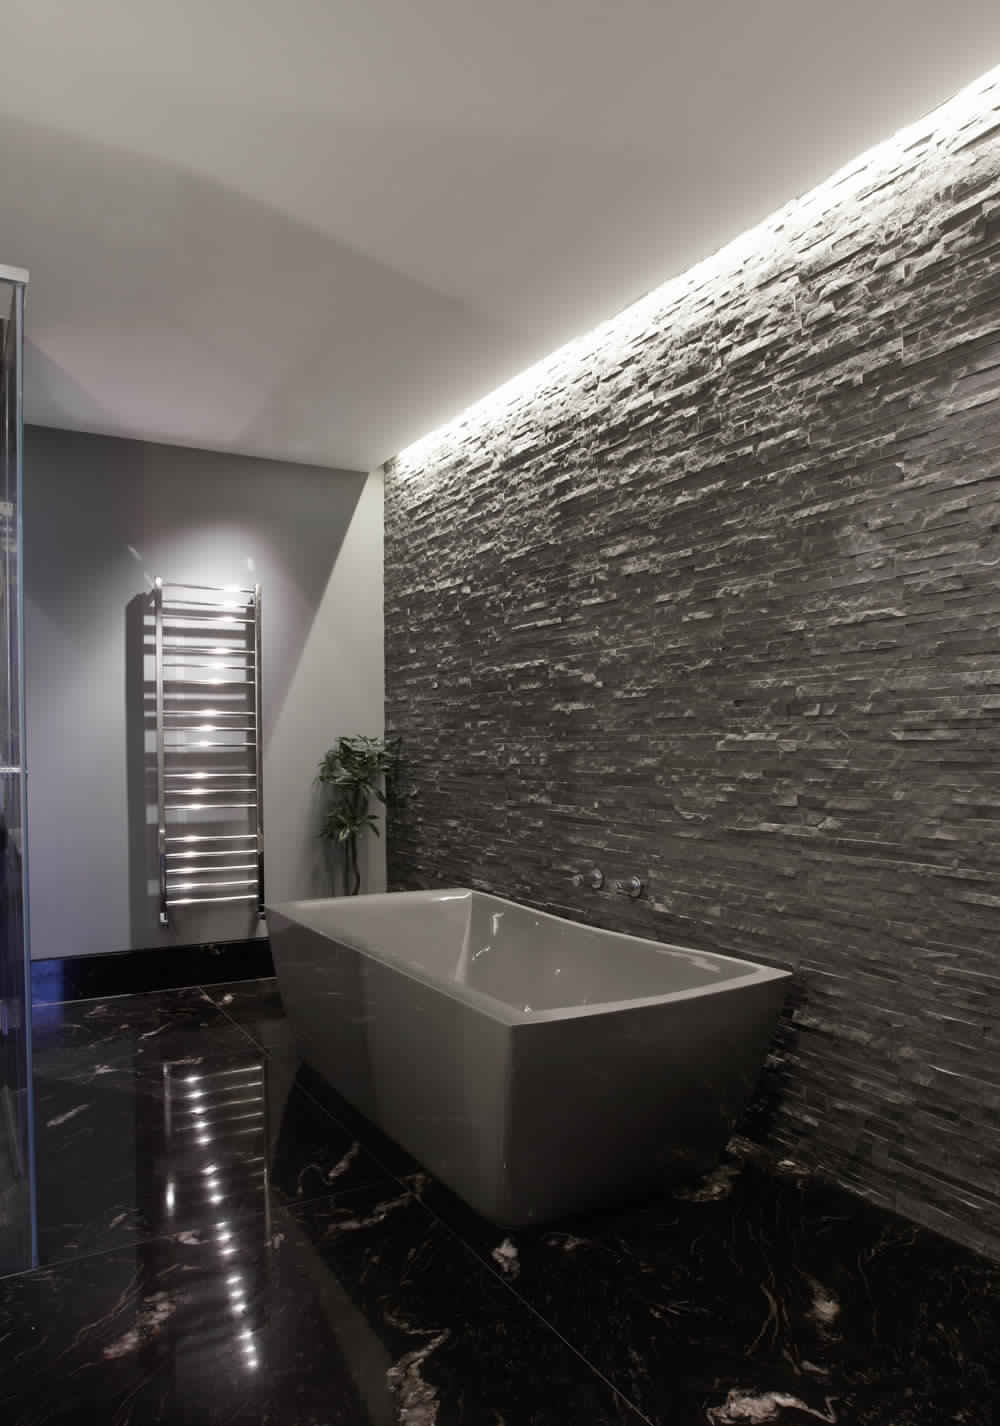 Knightsbridge-Residence-in-London-decoration-classique-luxe-salle de bain-cuisine-shower